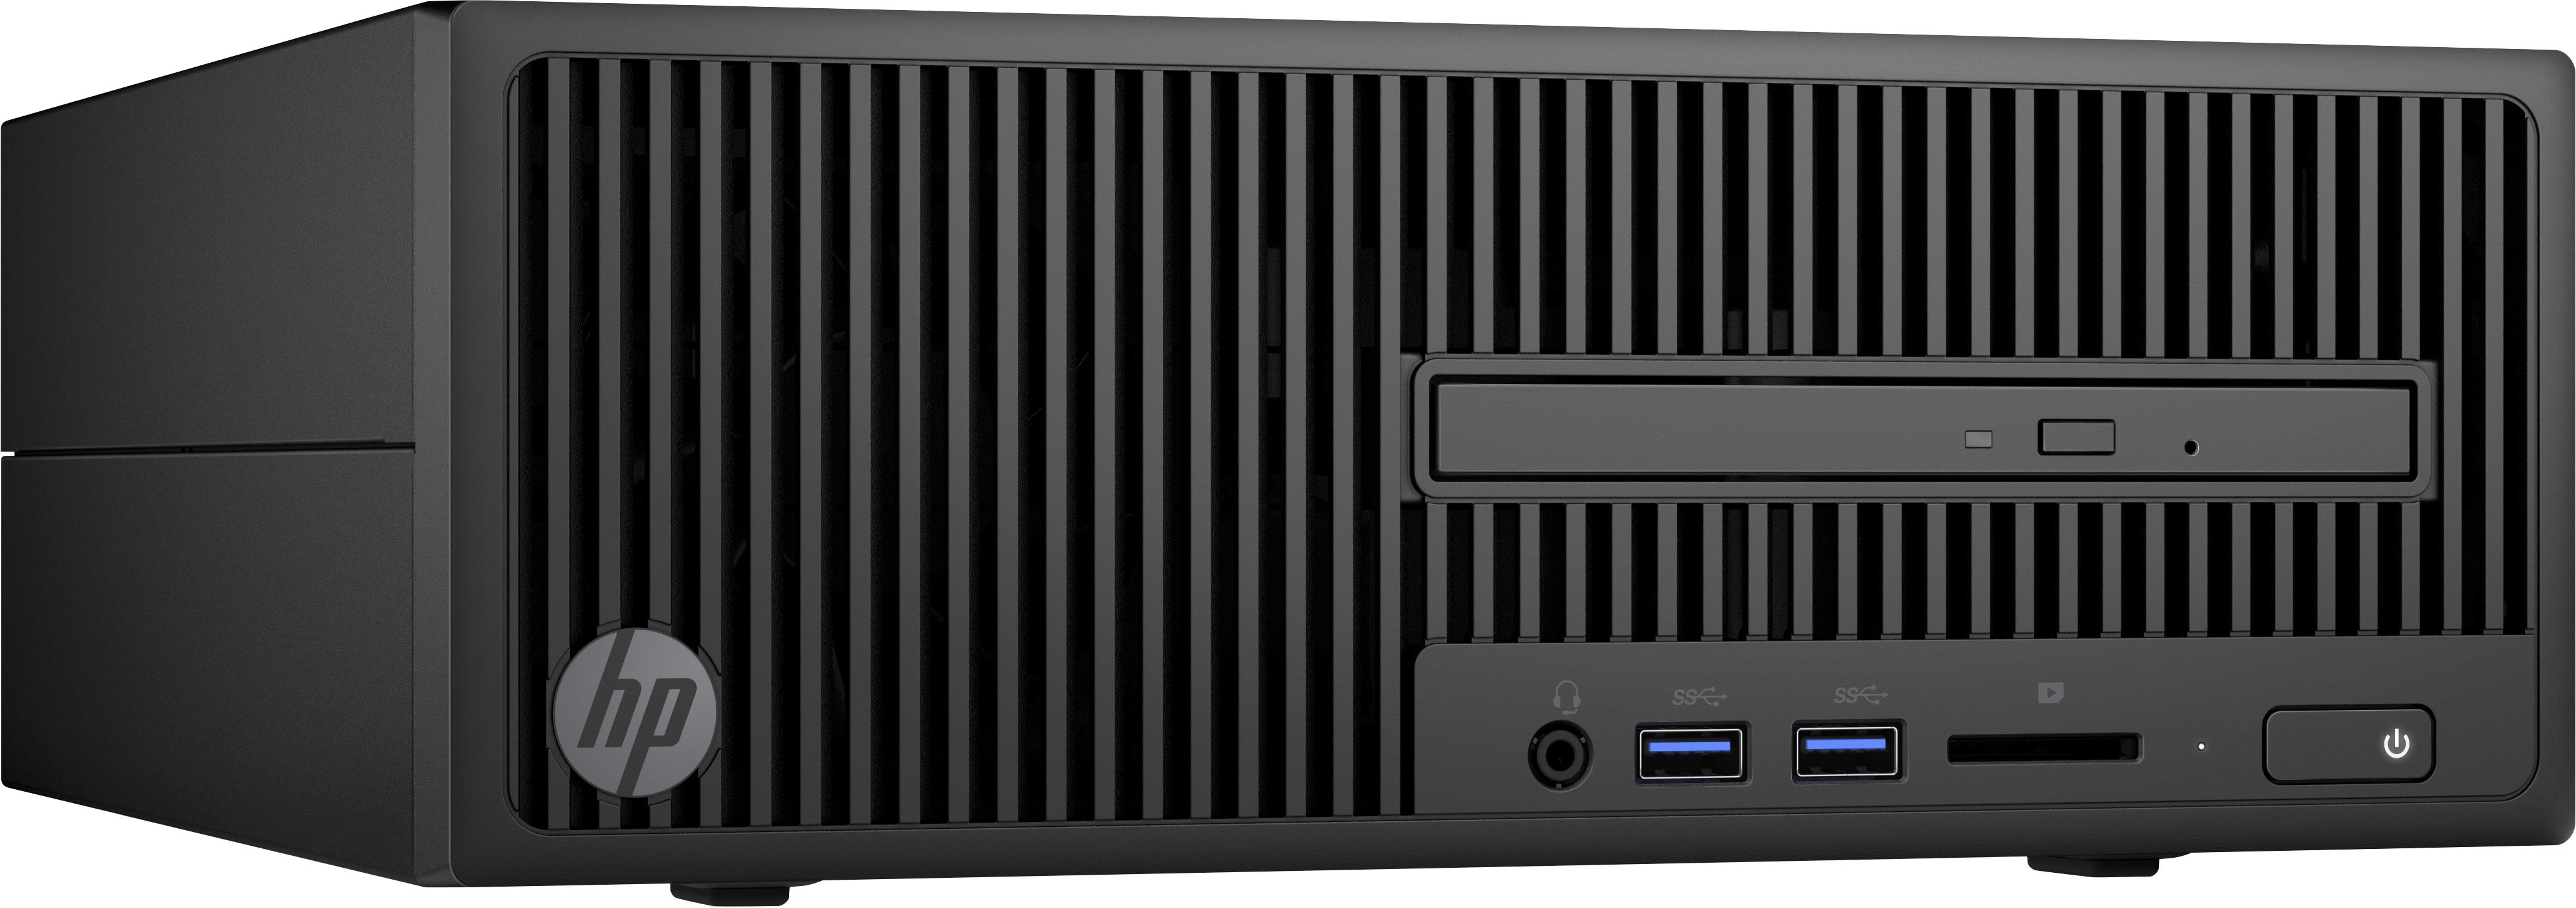 HP 280 G2 SFF Y5P88EA#ABU Pent G4400 4GB 500GB DVDRW Win 10 Pro